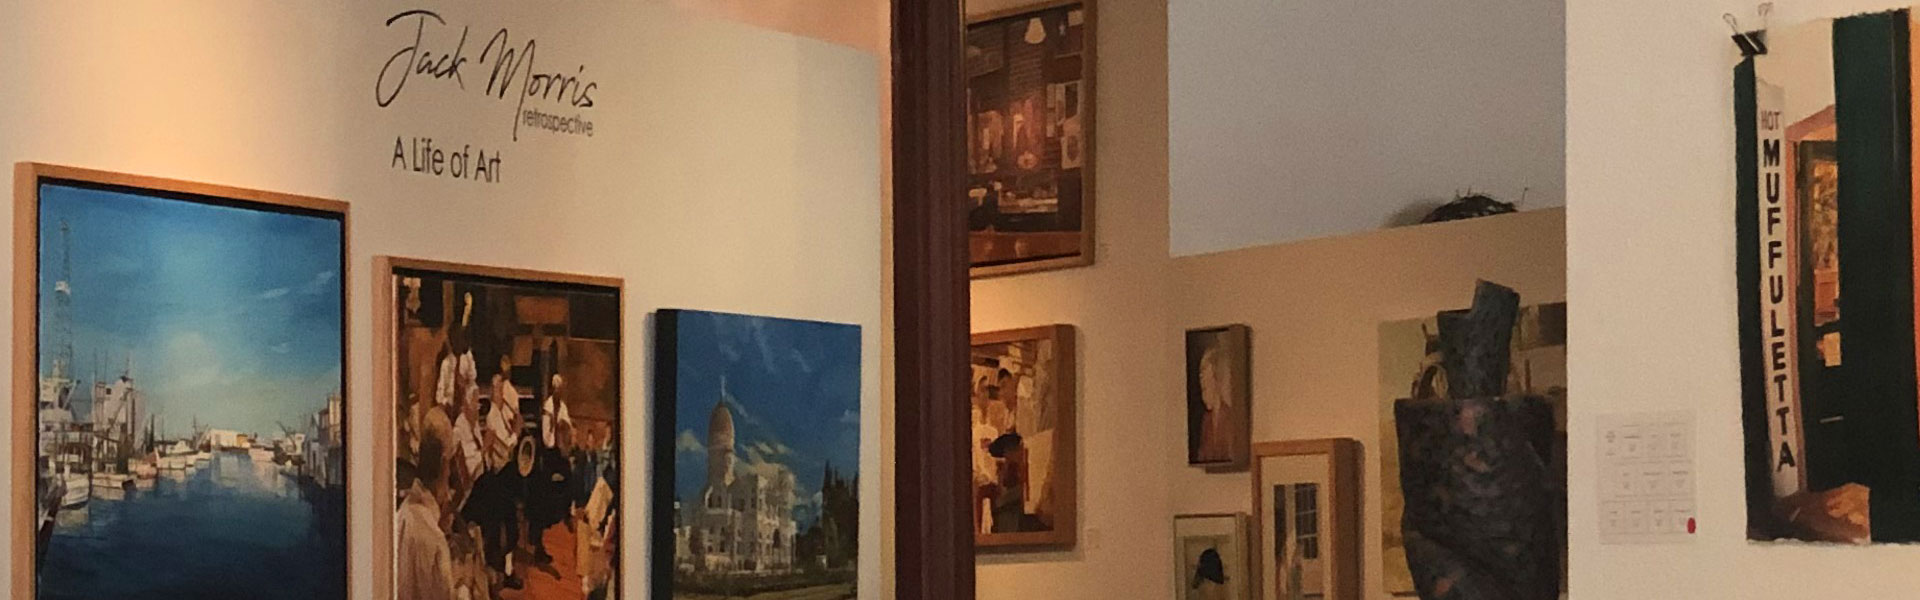 Interior of Third Coast Gallery, Galveston TX